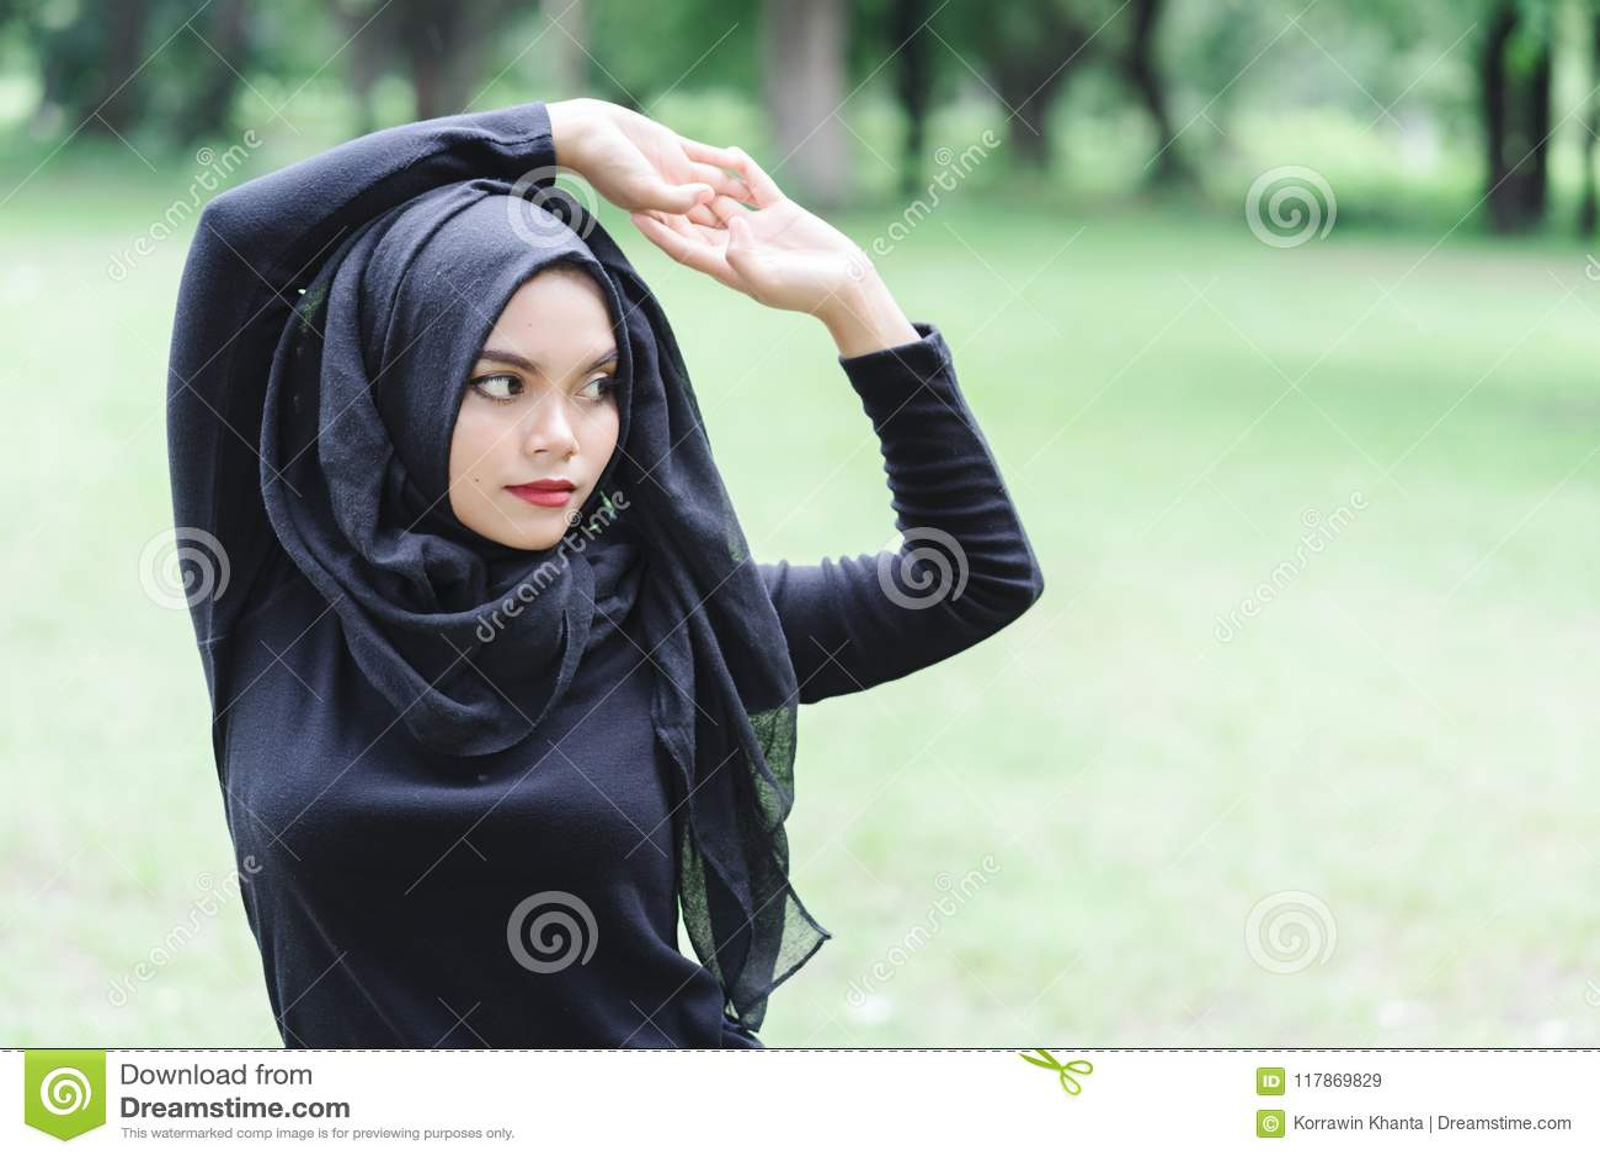 Girl pakistan images beautiful Nepal's 27